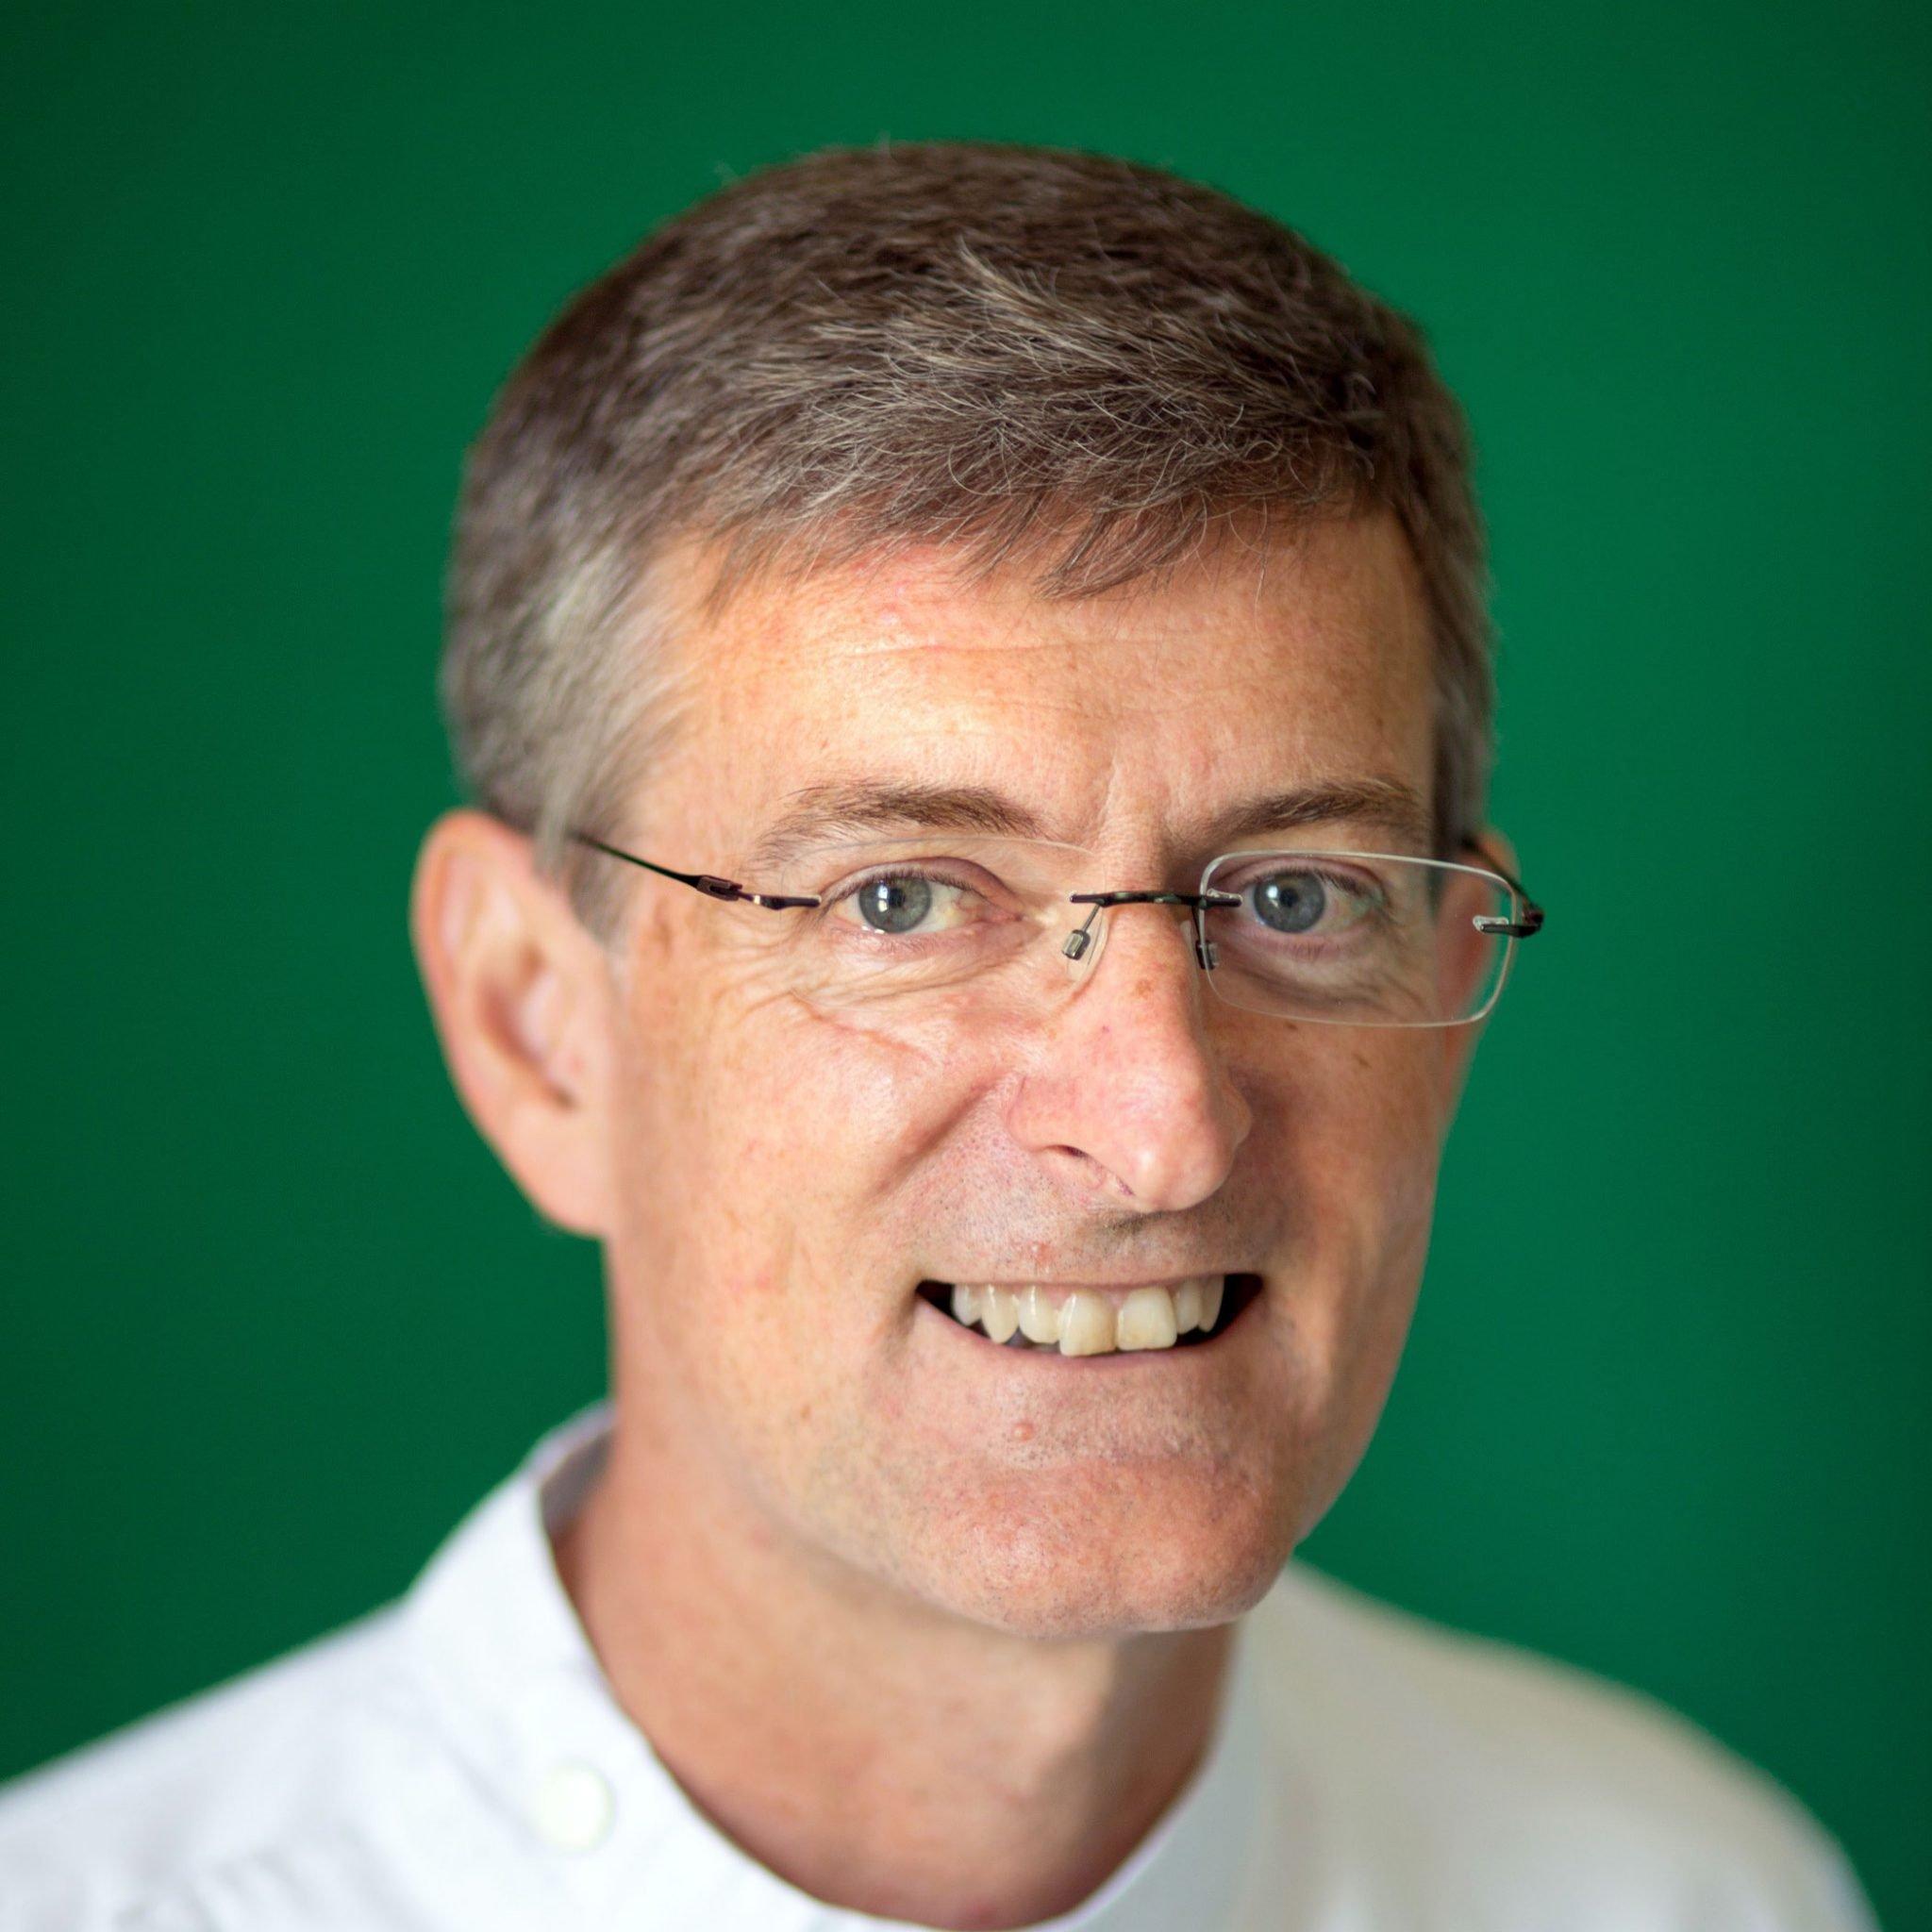 Dr. Richard Linton